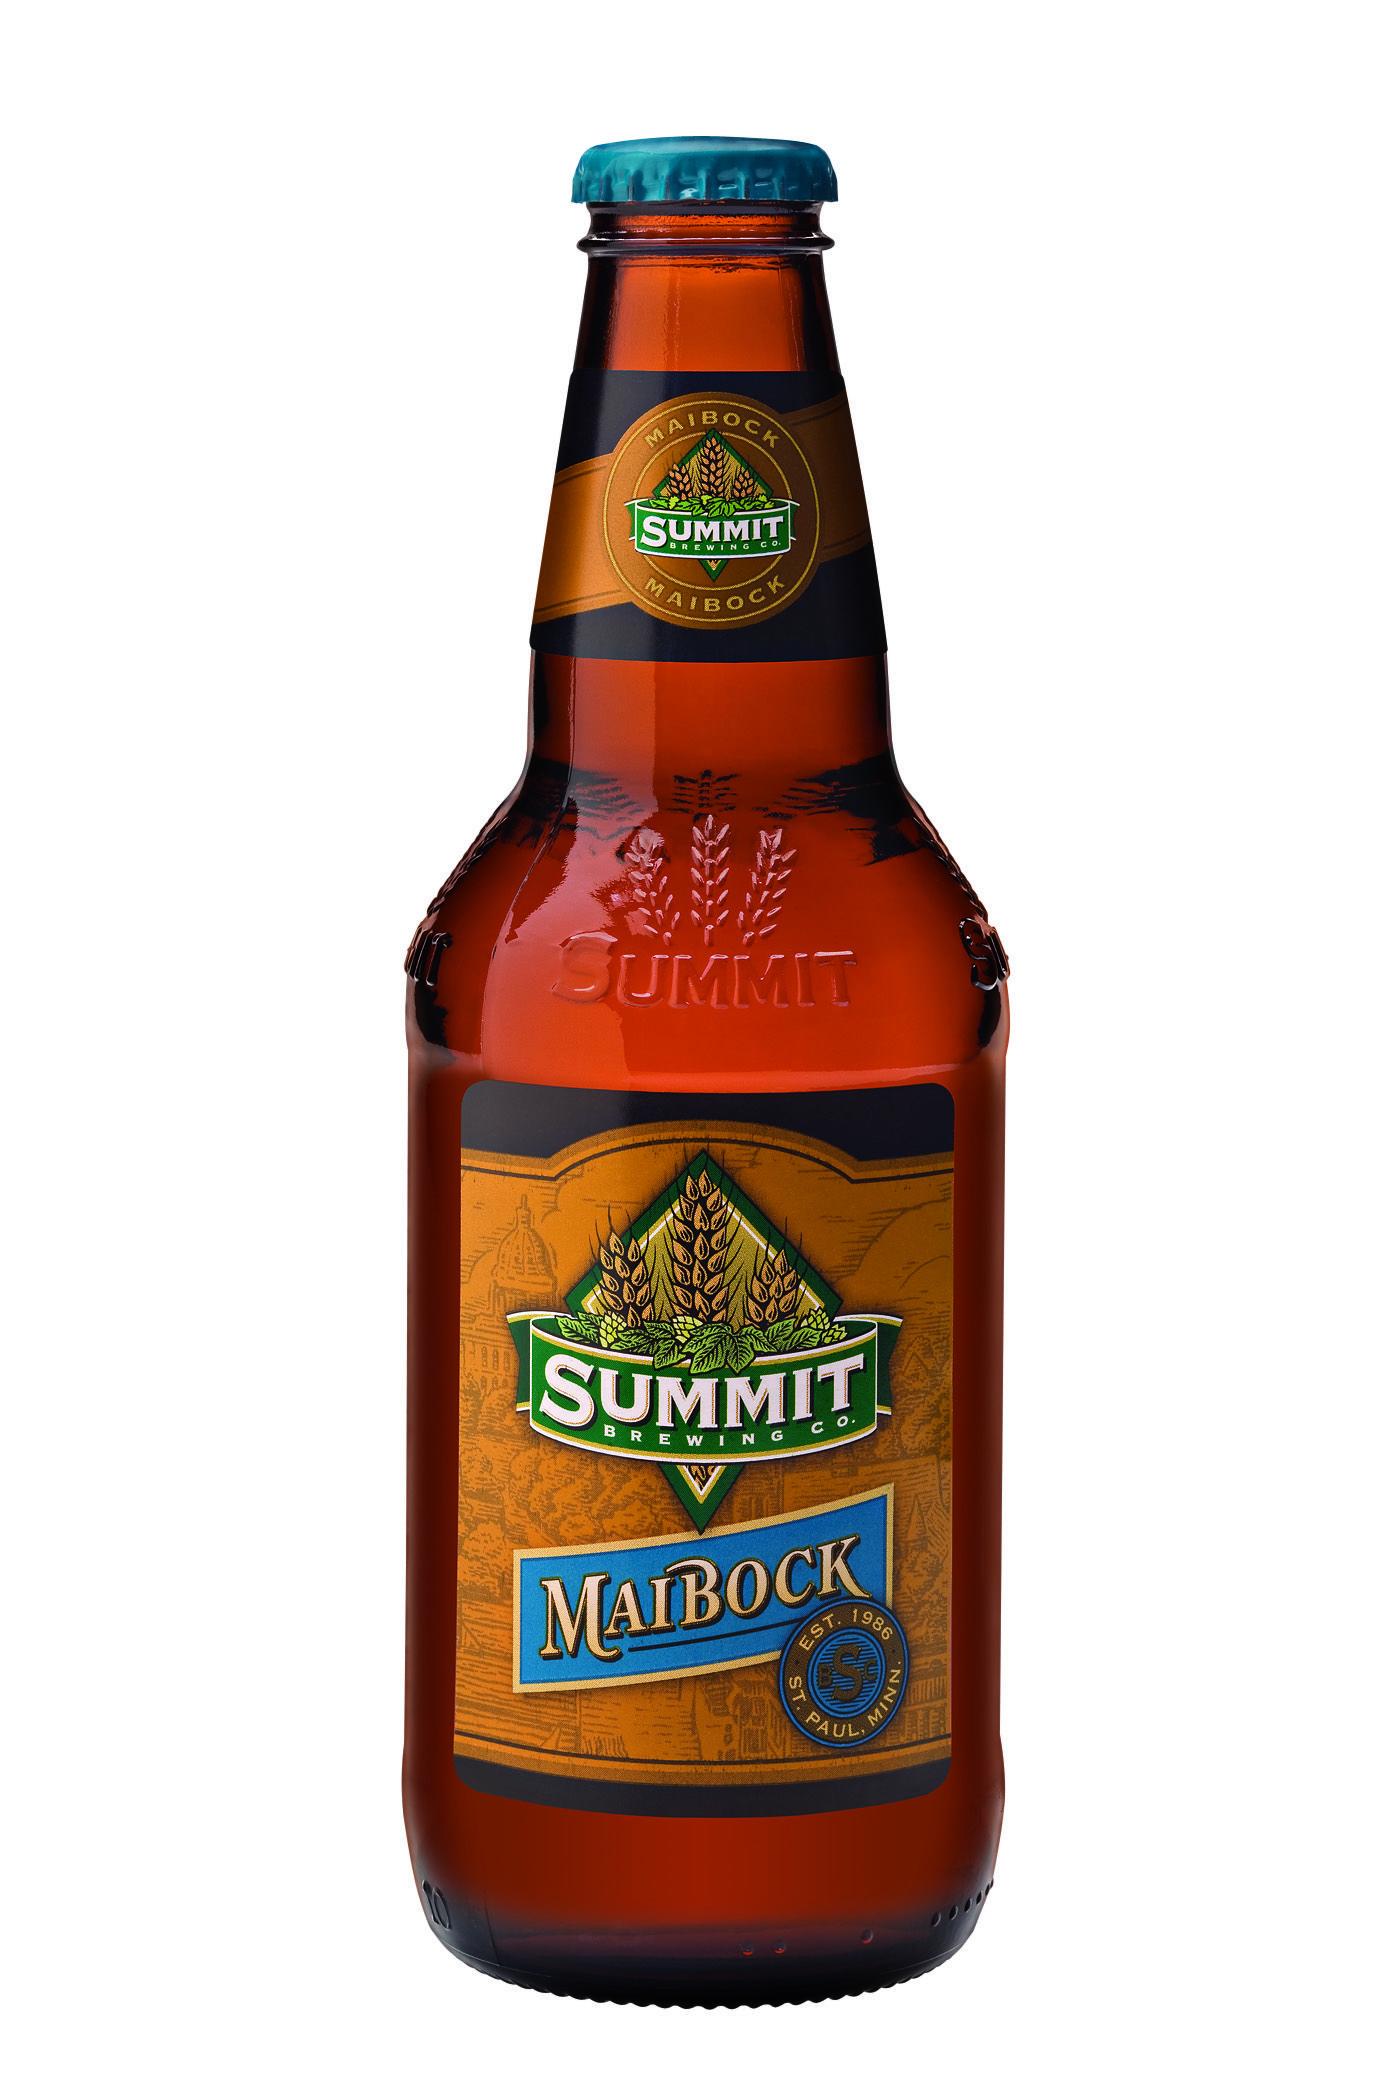 Maibock Bottle Beers Of The World Beer Bottle